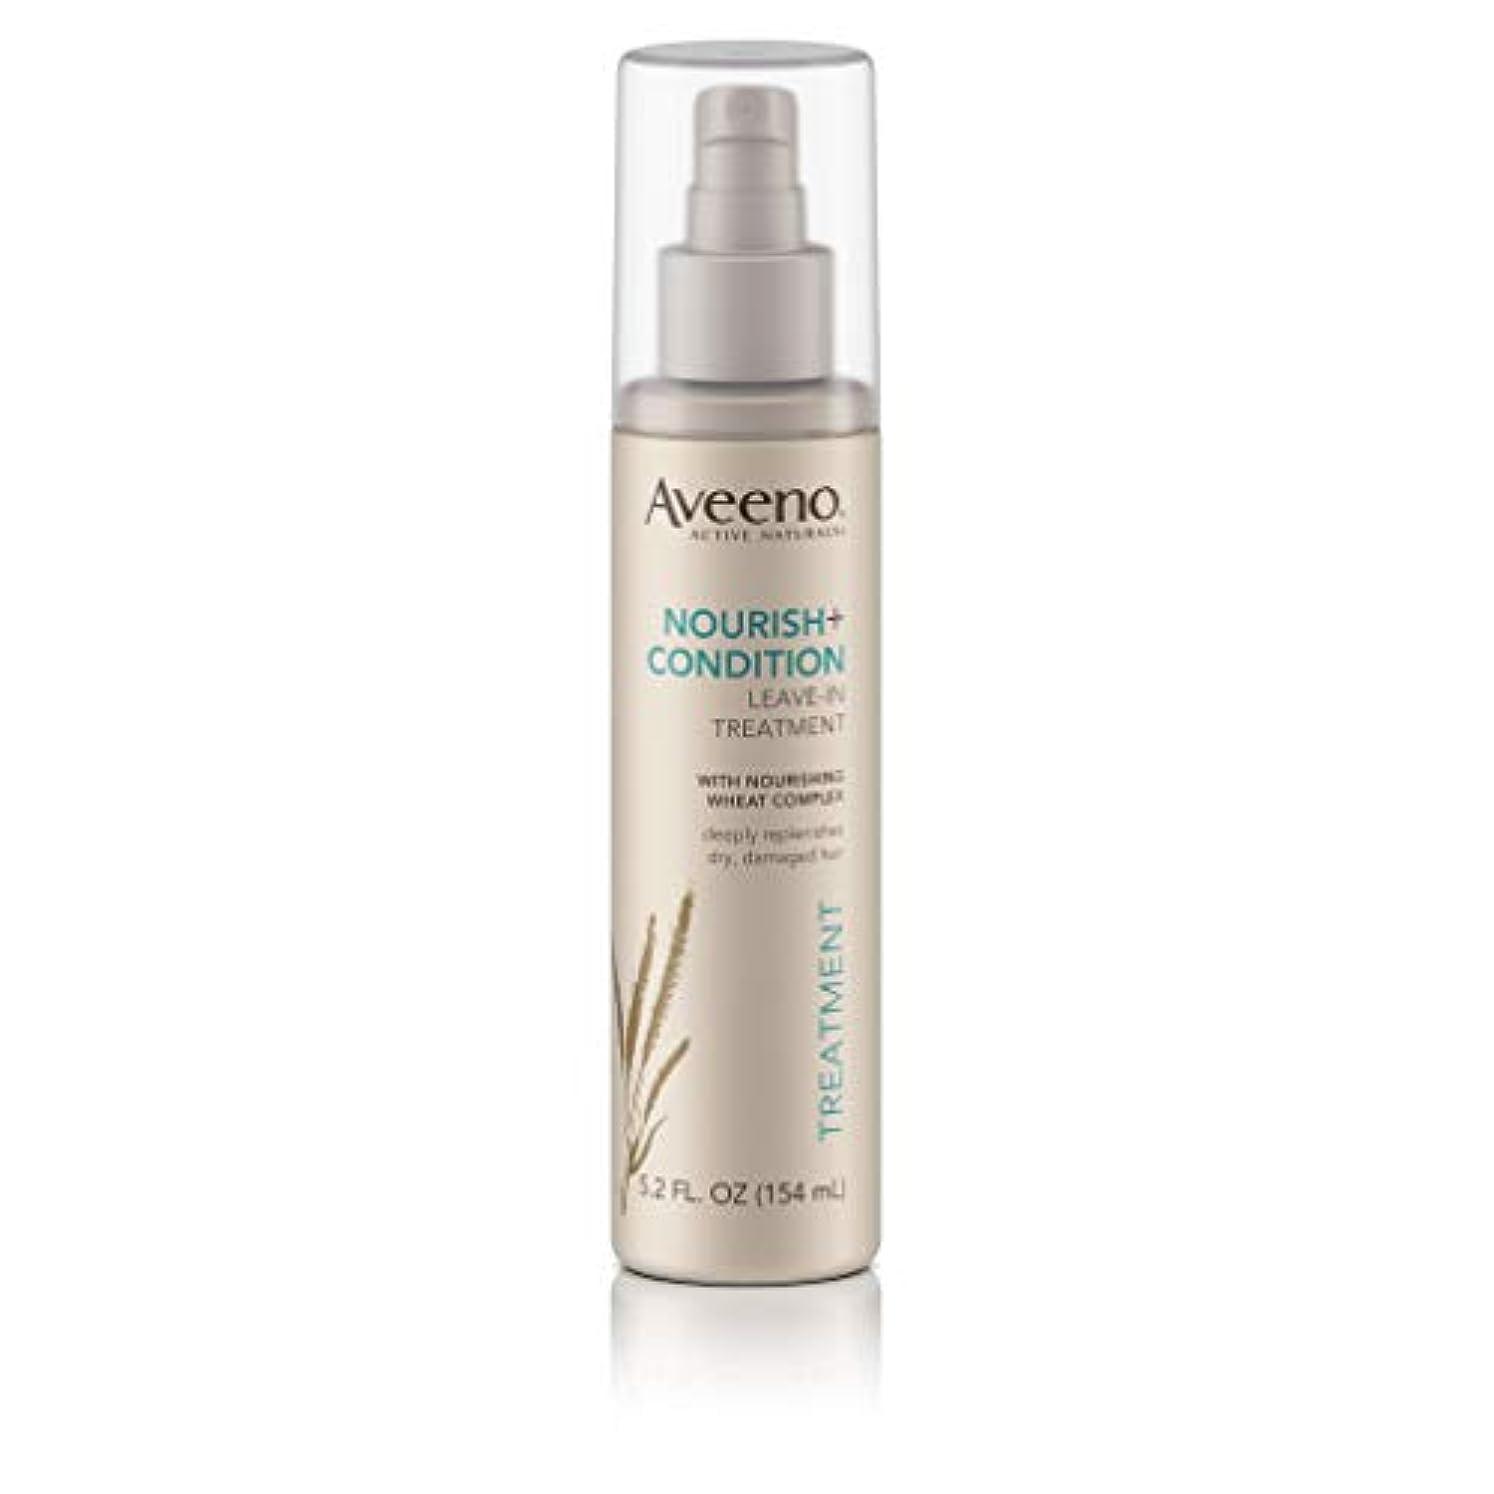 Aveeno Nourish+ Condition Treatment Spray 150g (並行輸入品)